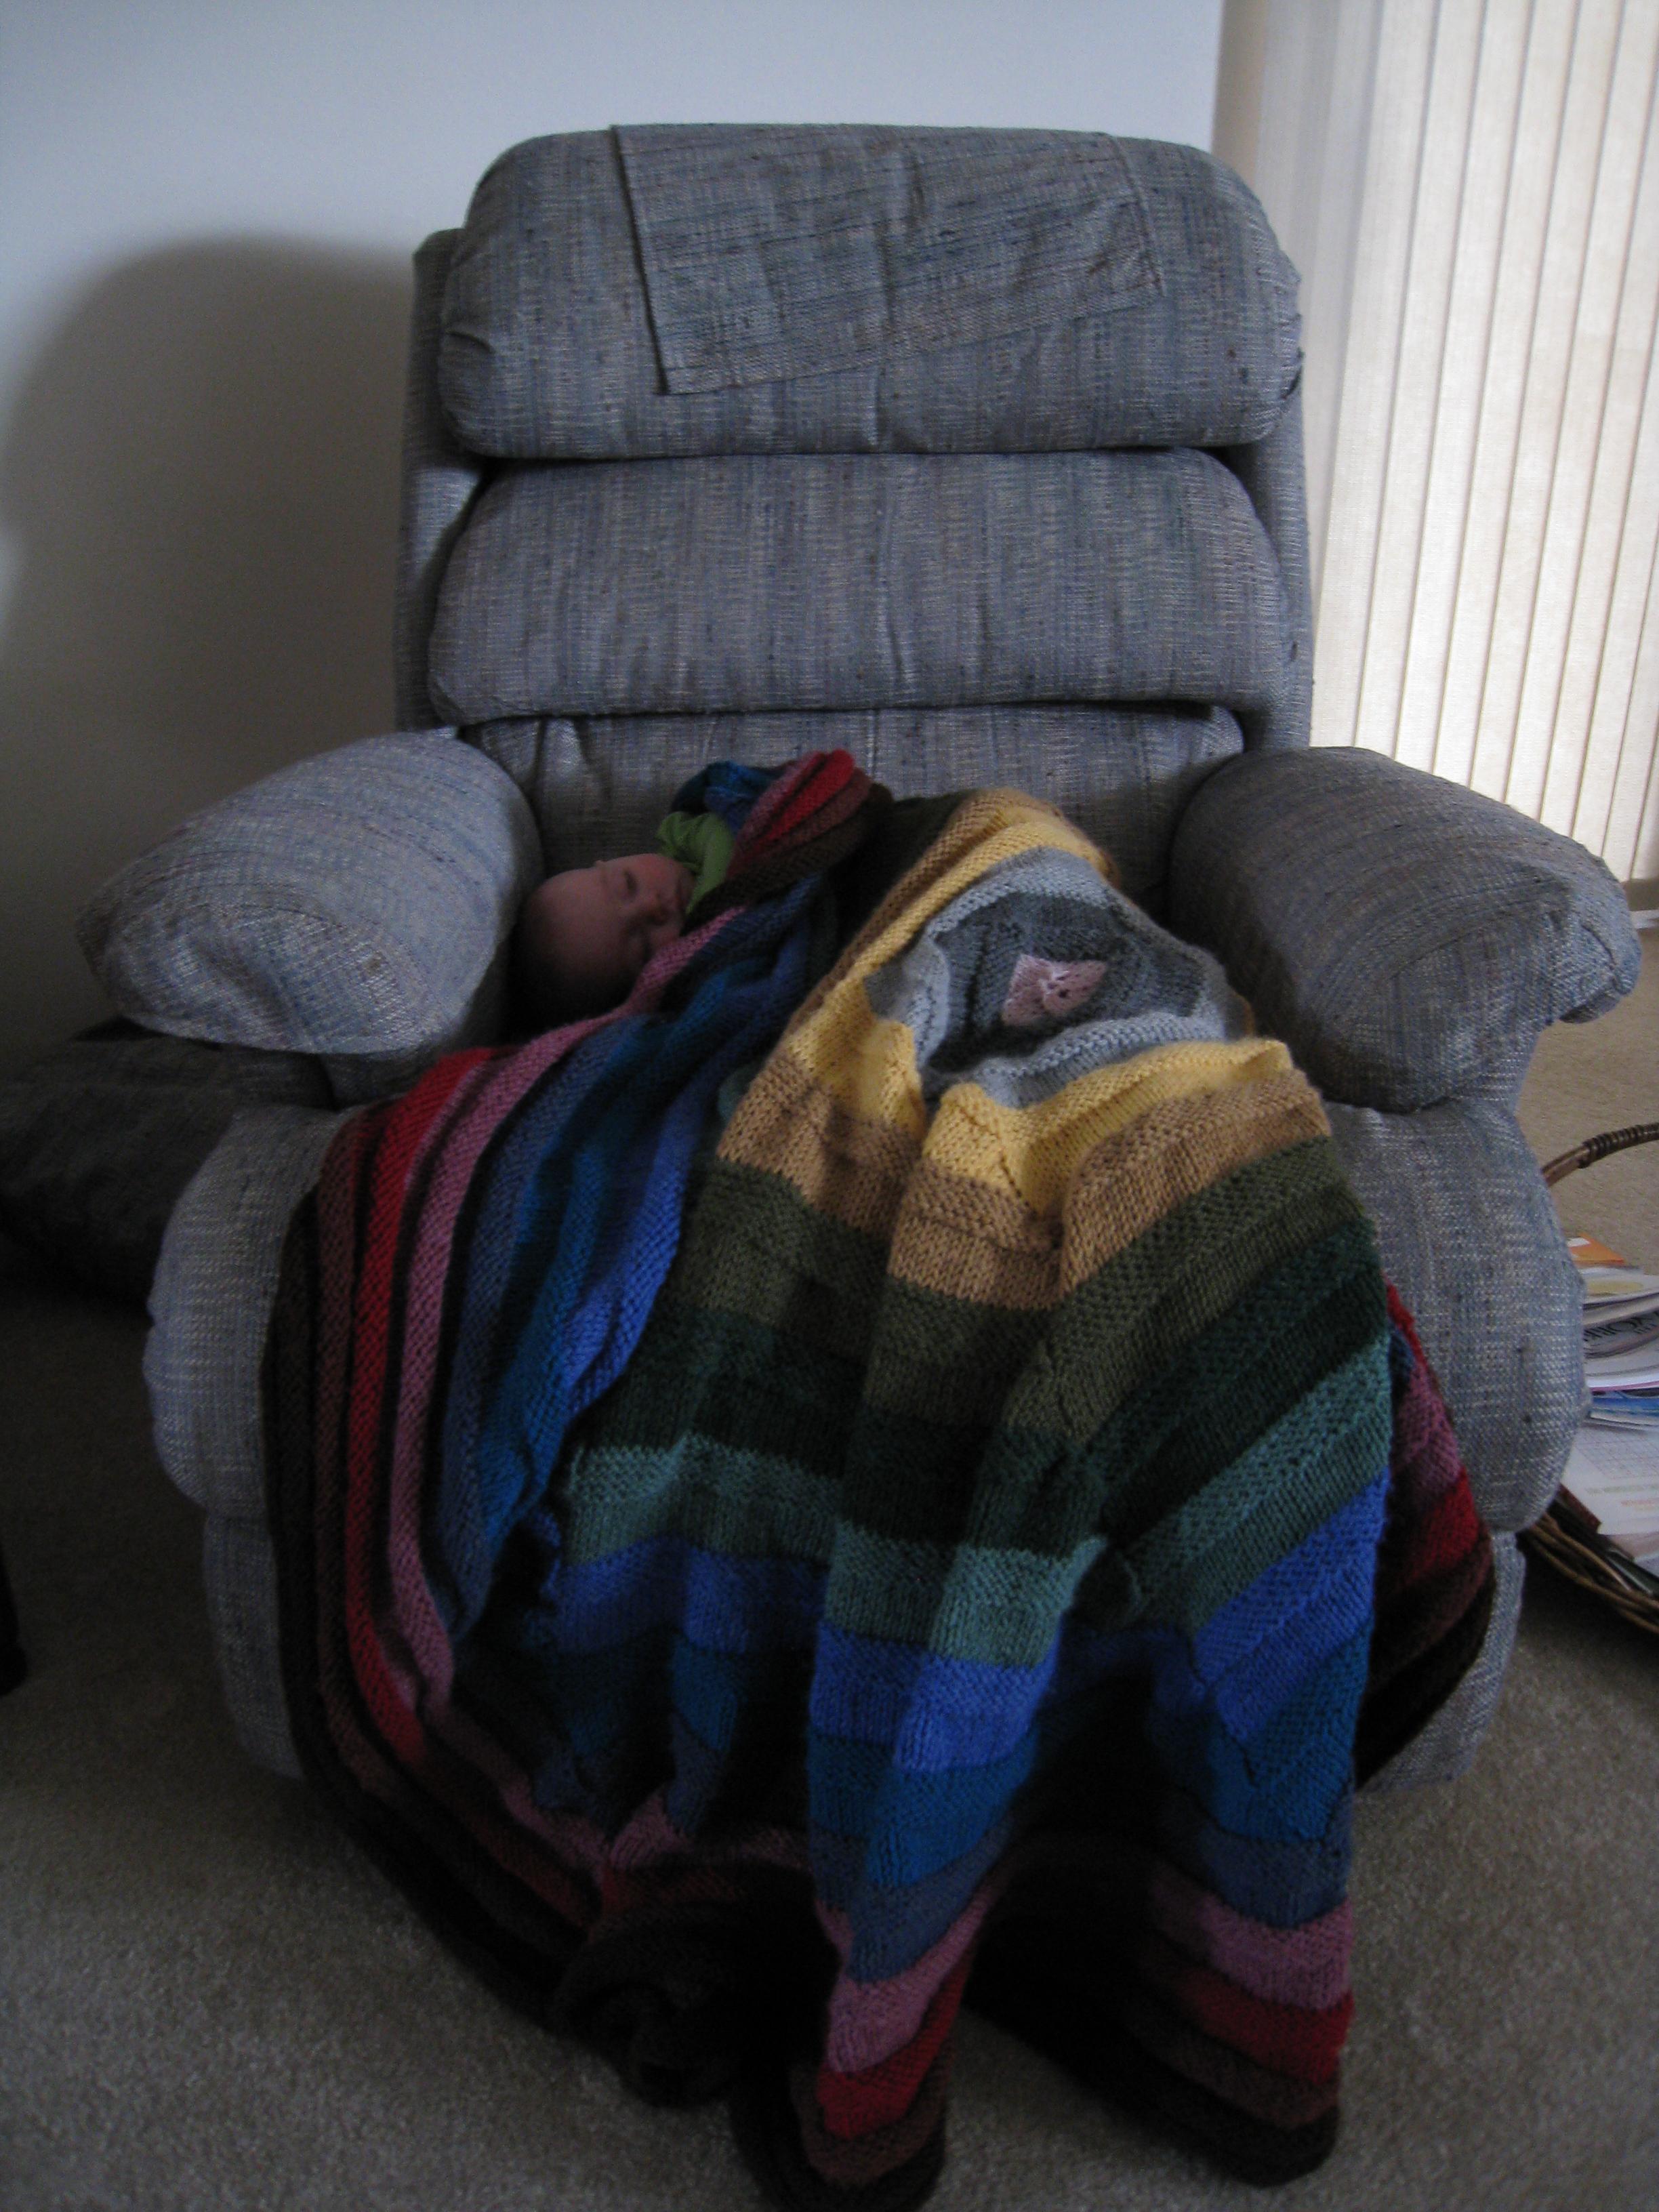 big-chair-little-baby